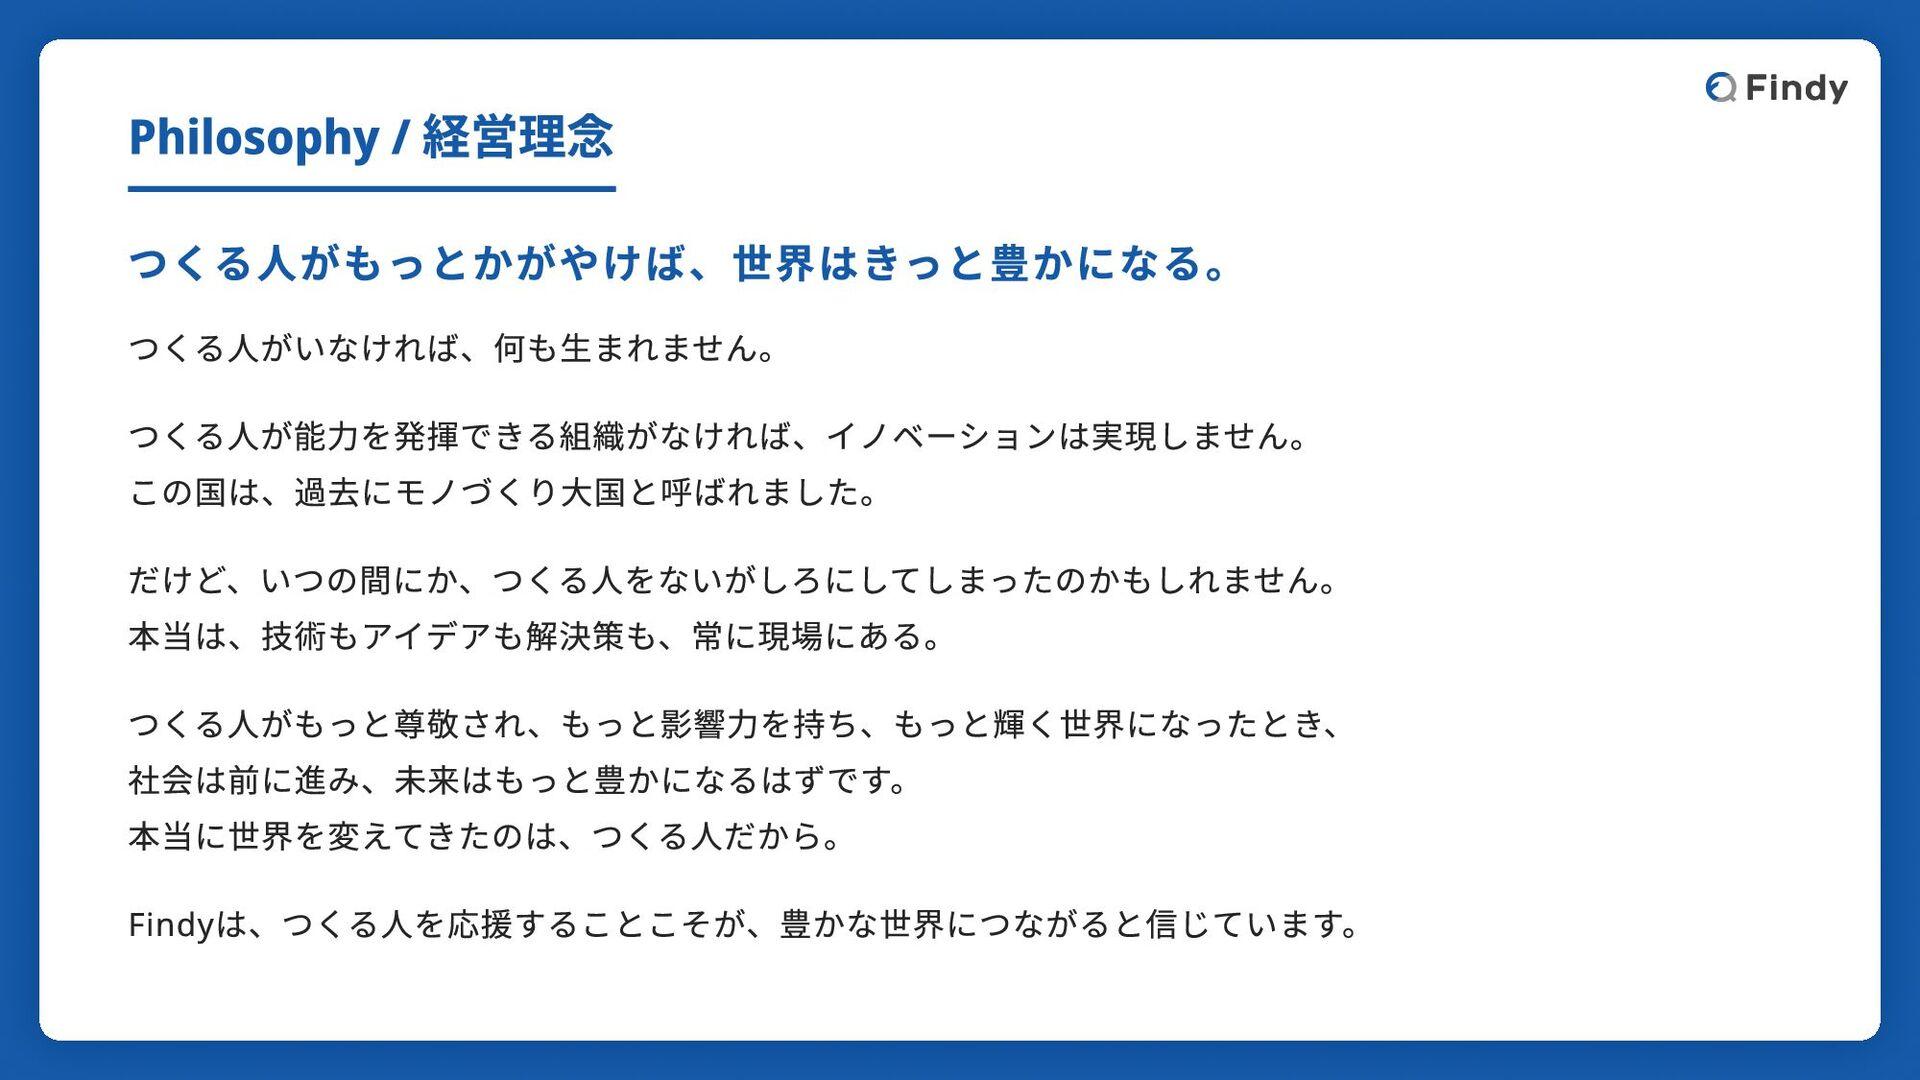 © 2020 Findy Inc. 日本は技術後進国へ 革新的なサービスは海外発 ランキング ...